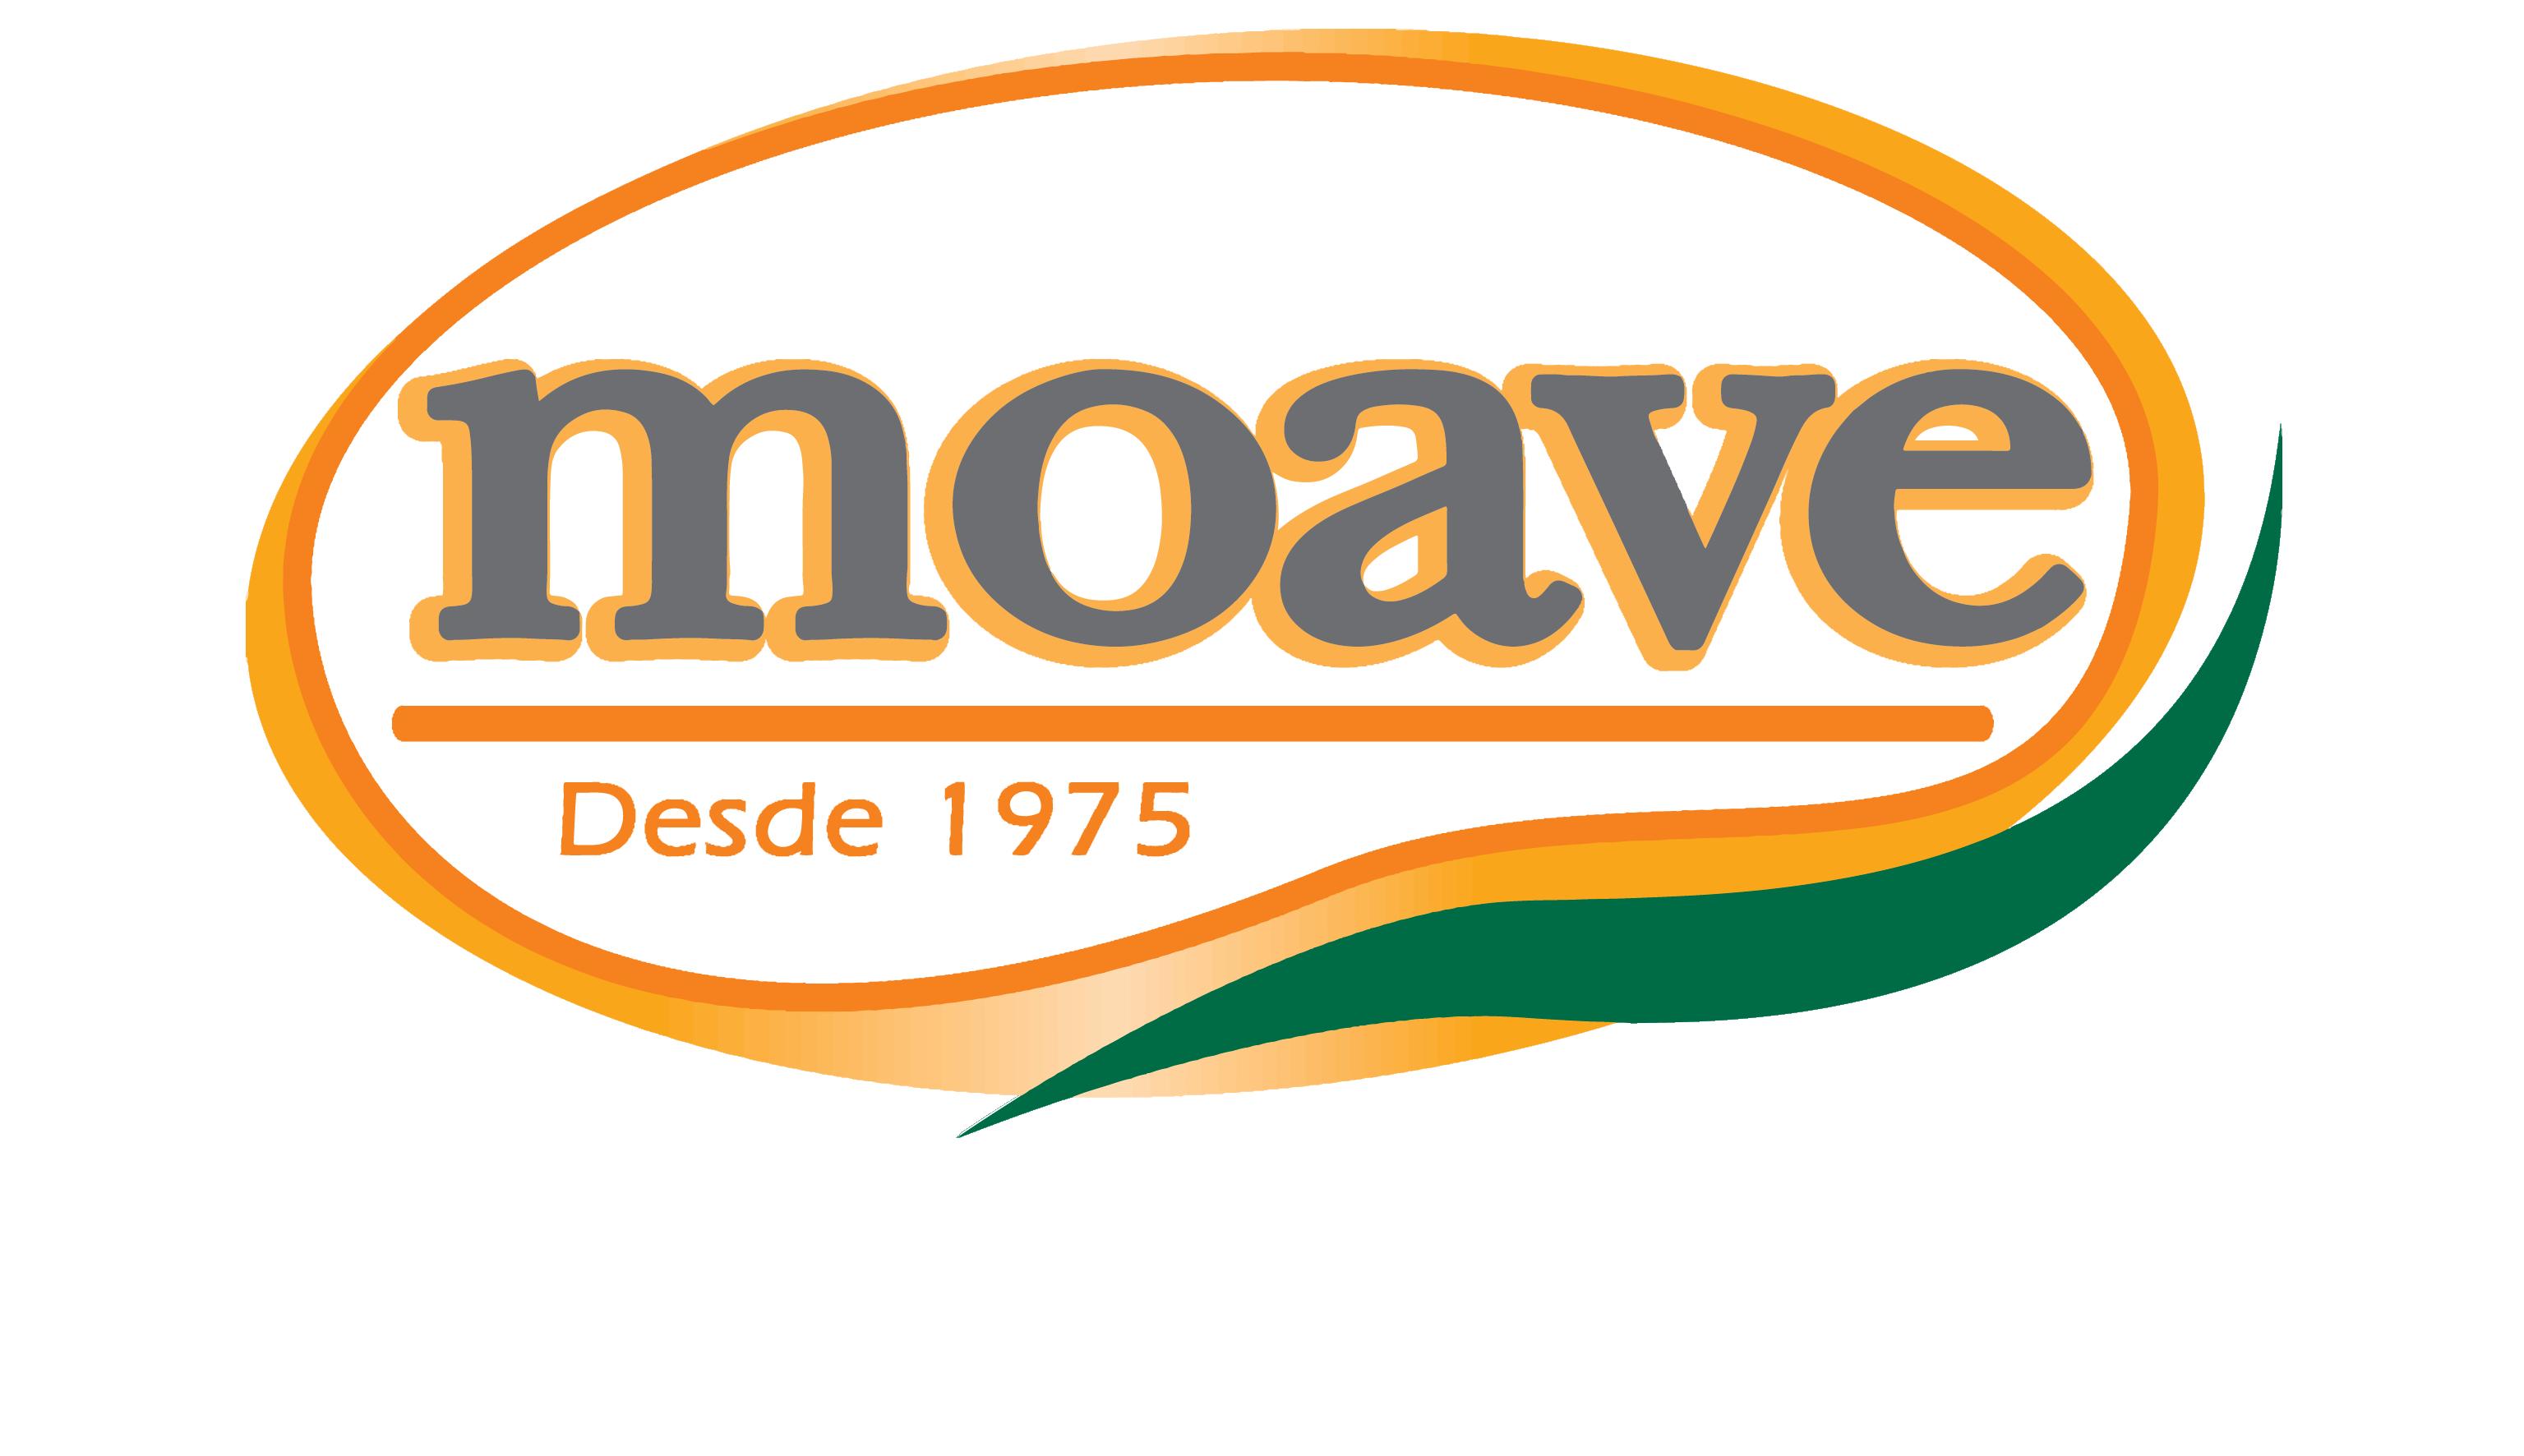 A MOAVE - Moagem de Cabo Verde, SA